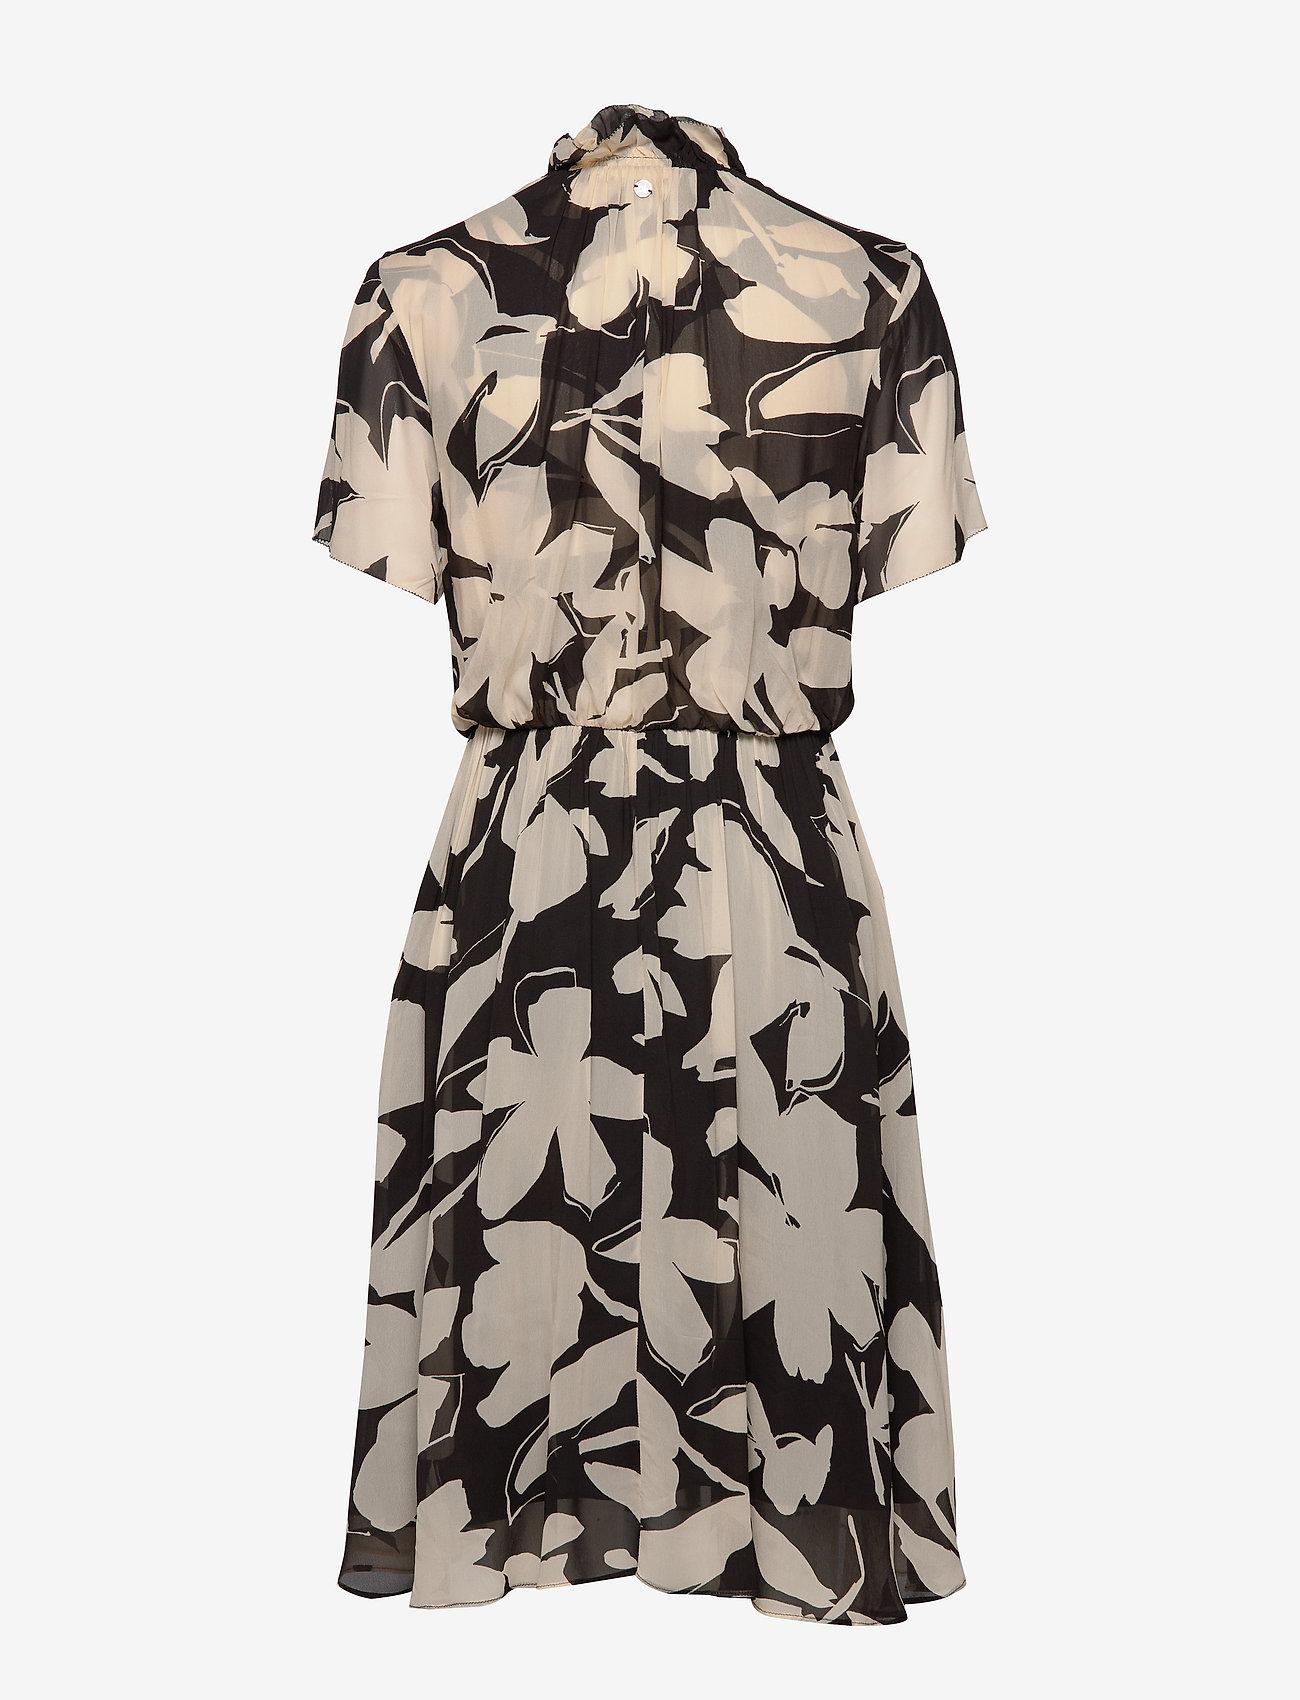 Prt Georgette Ruffle (Bold Floral - Black / Macadami) (1960 kr) - Calvin Klein